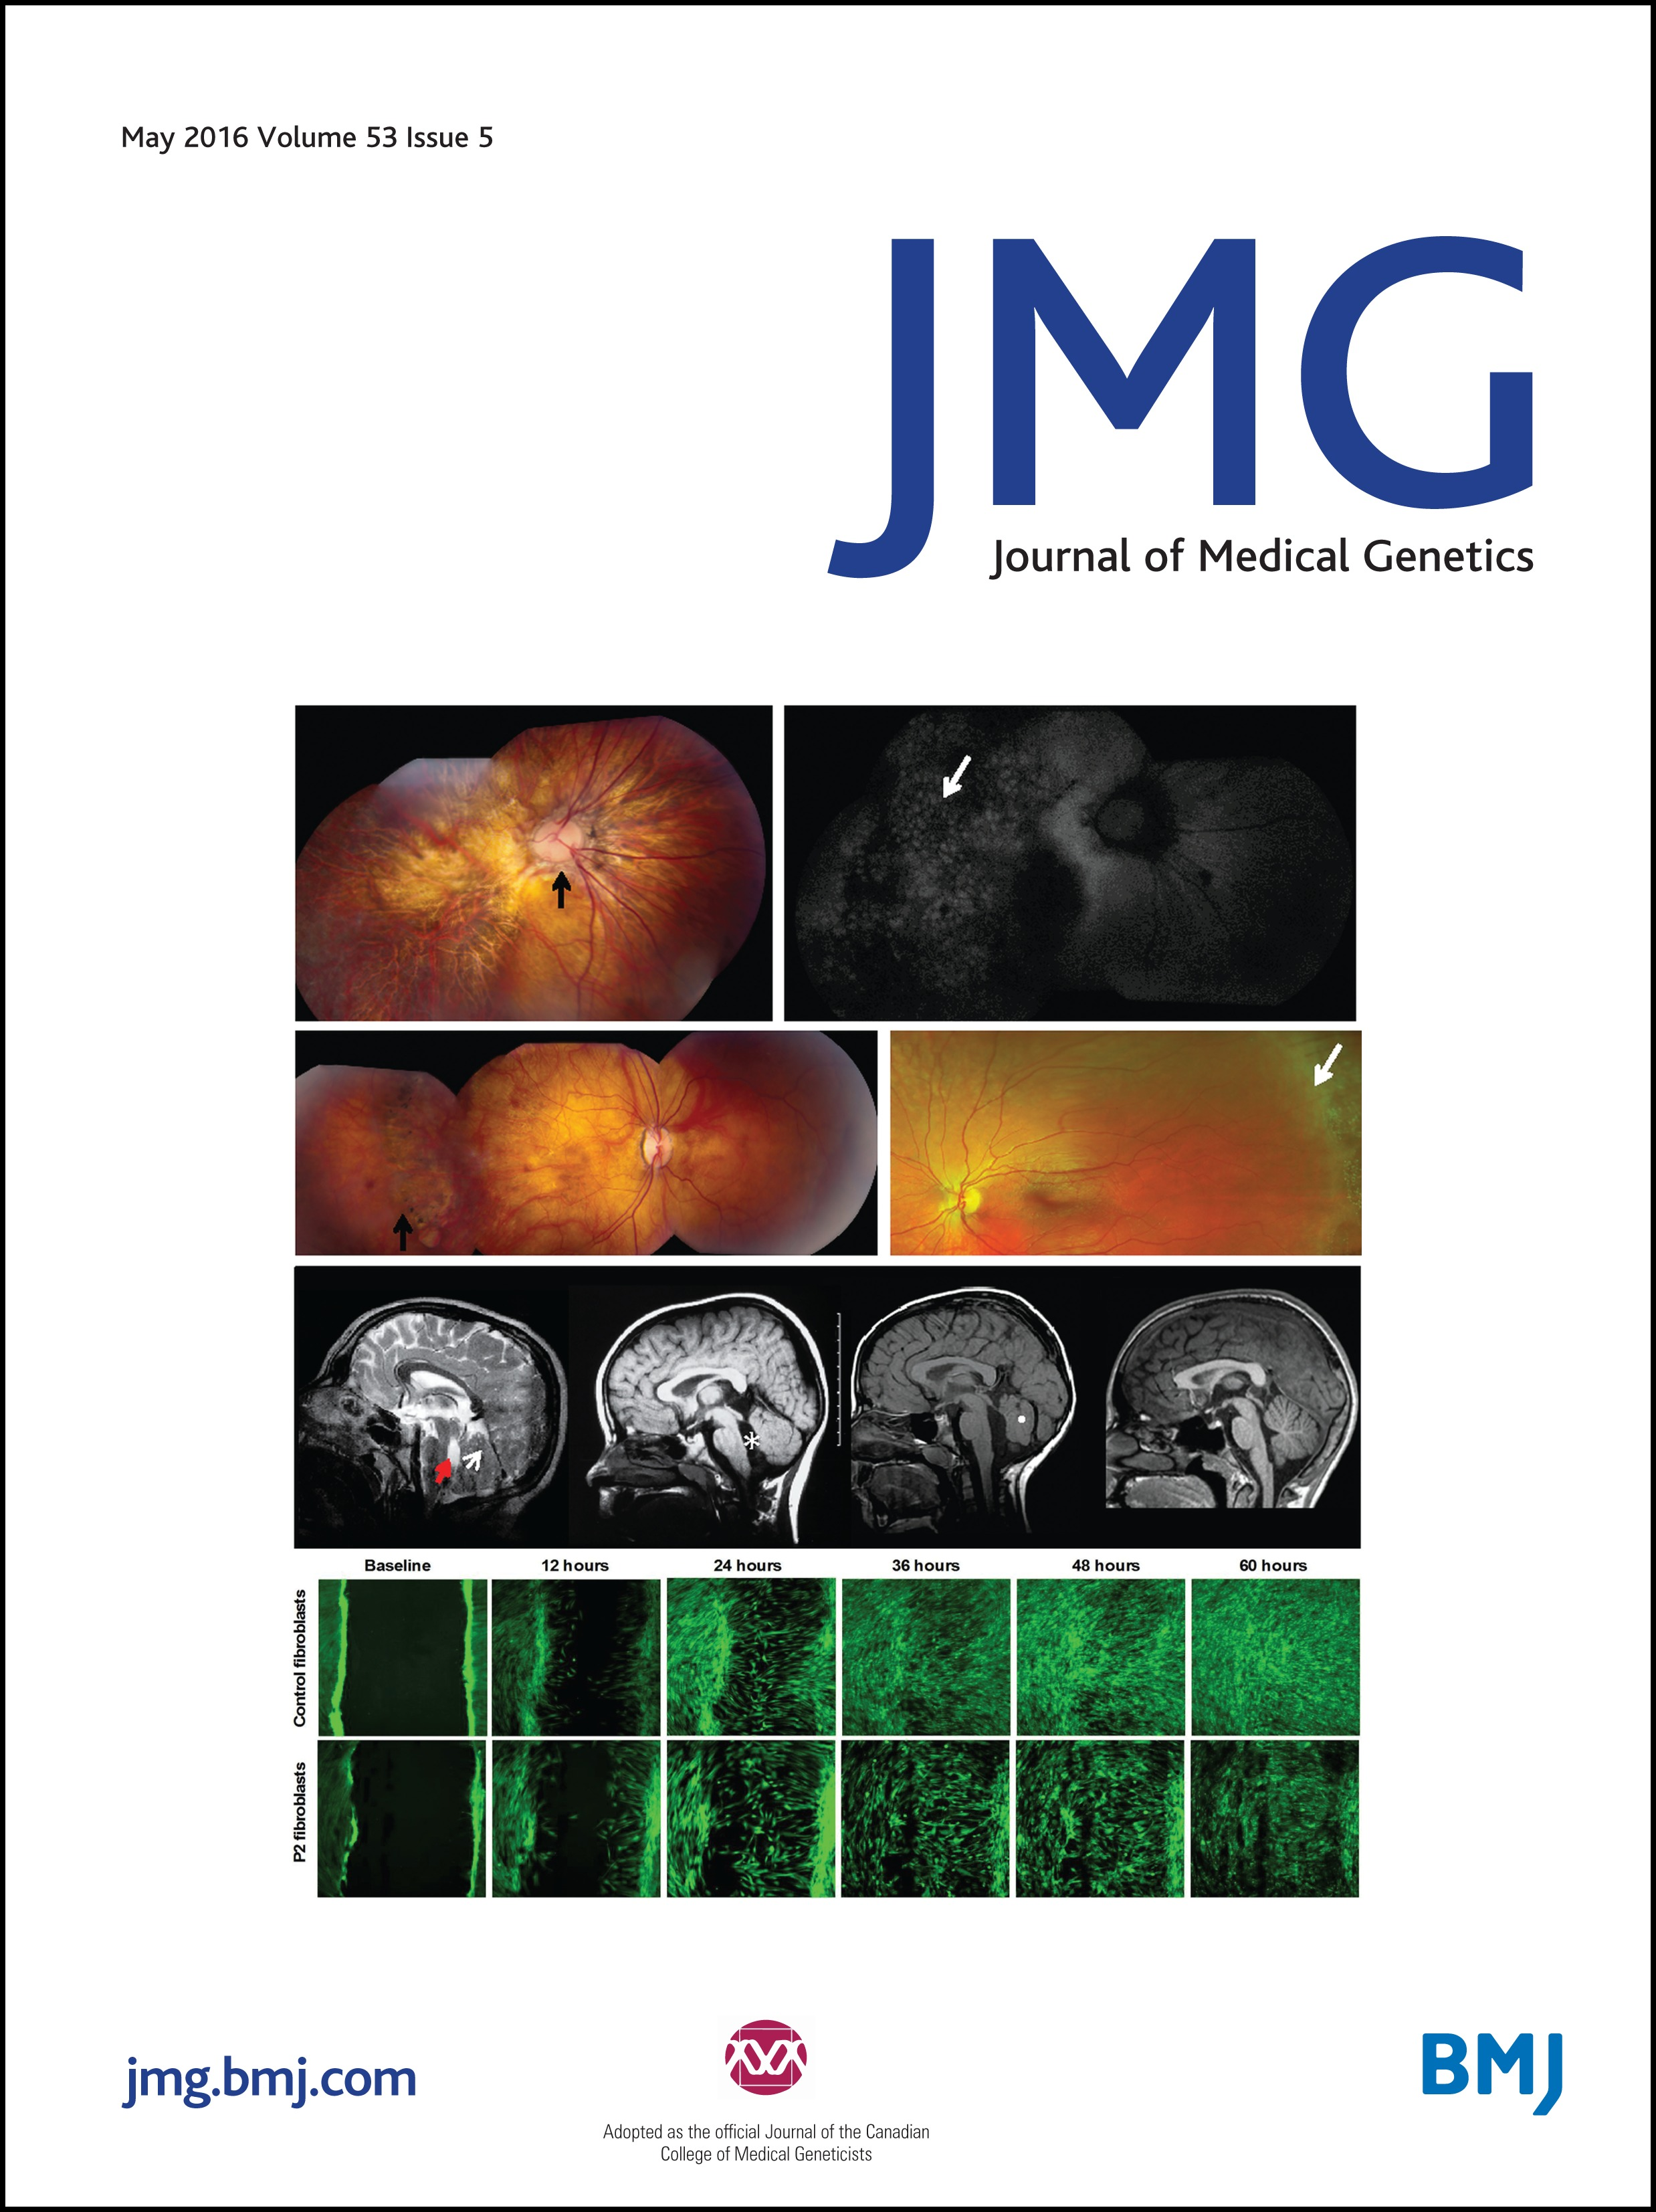 Genetic Spectrum Of Saudi Arabian Patients With Antenatal Cystic Kd Tools 2524 Short Circuit Detector Walmartcom Kidney Disease And Ciliopathy Phenotypes Using A Targeted Renal Gene Panel Journal